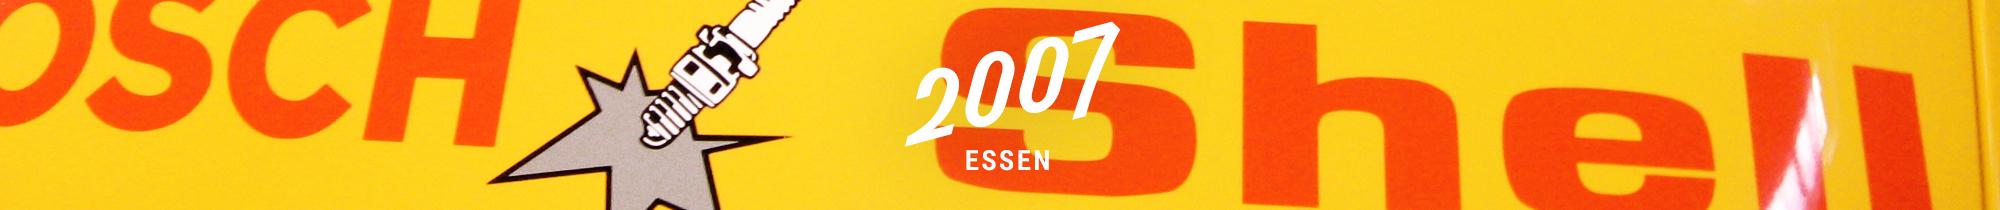 2007-essen-slidi-01